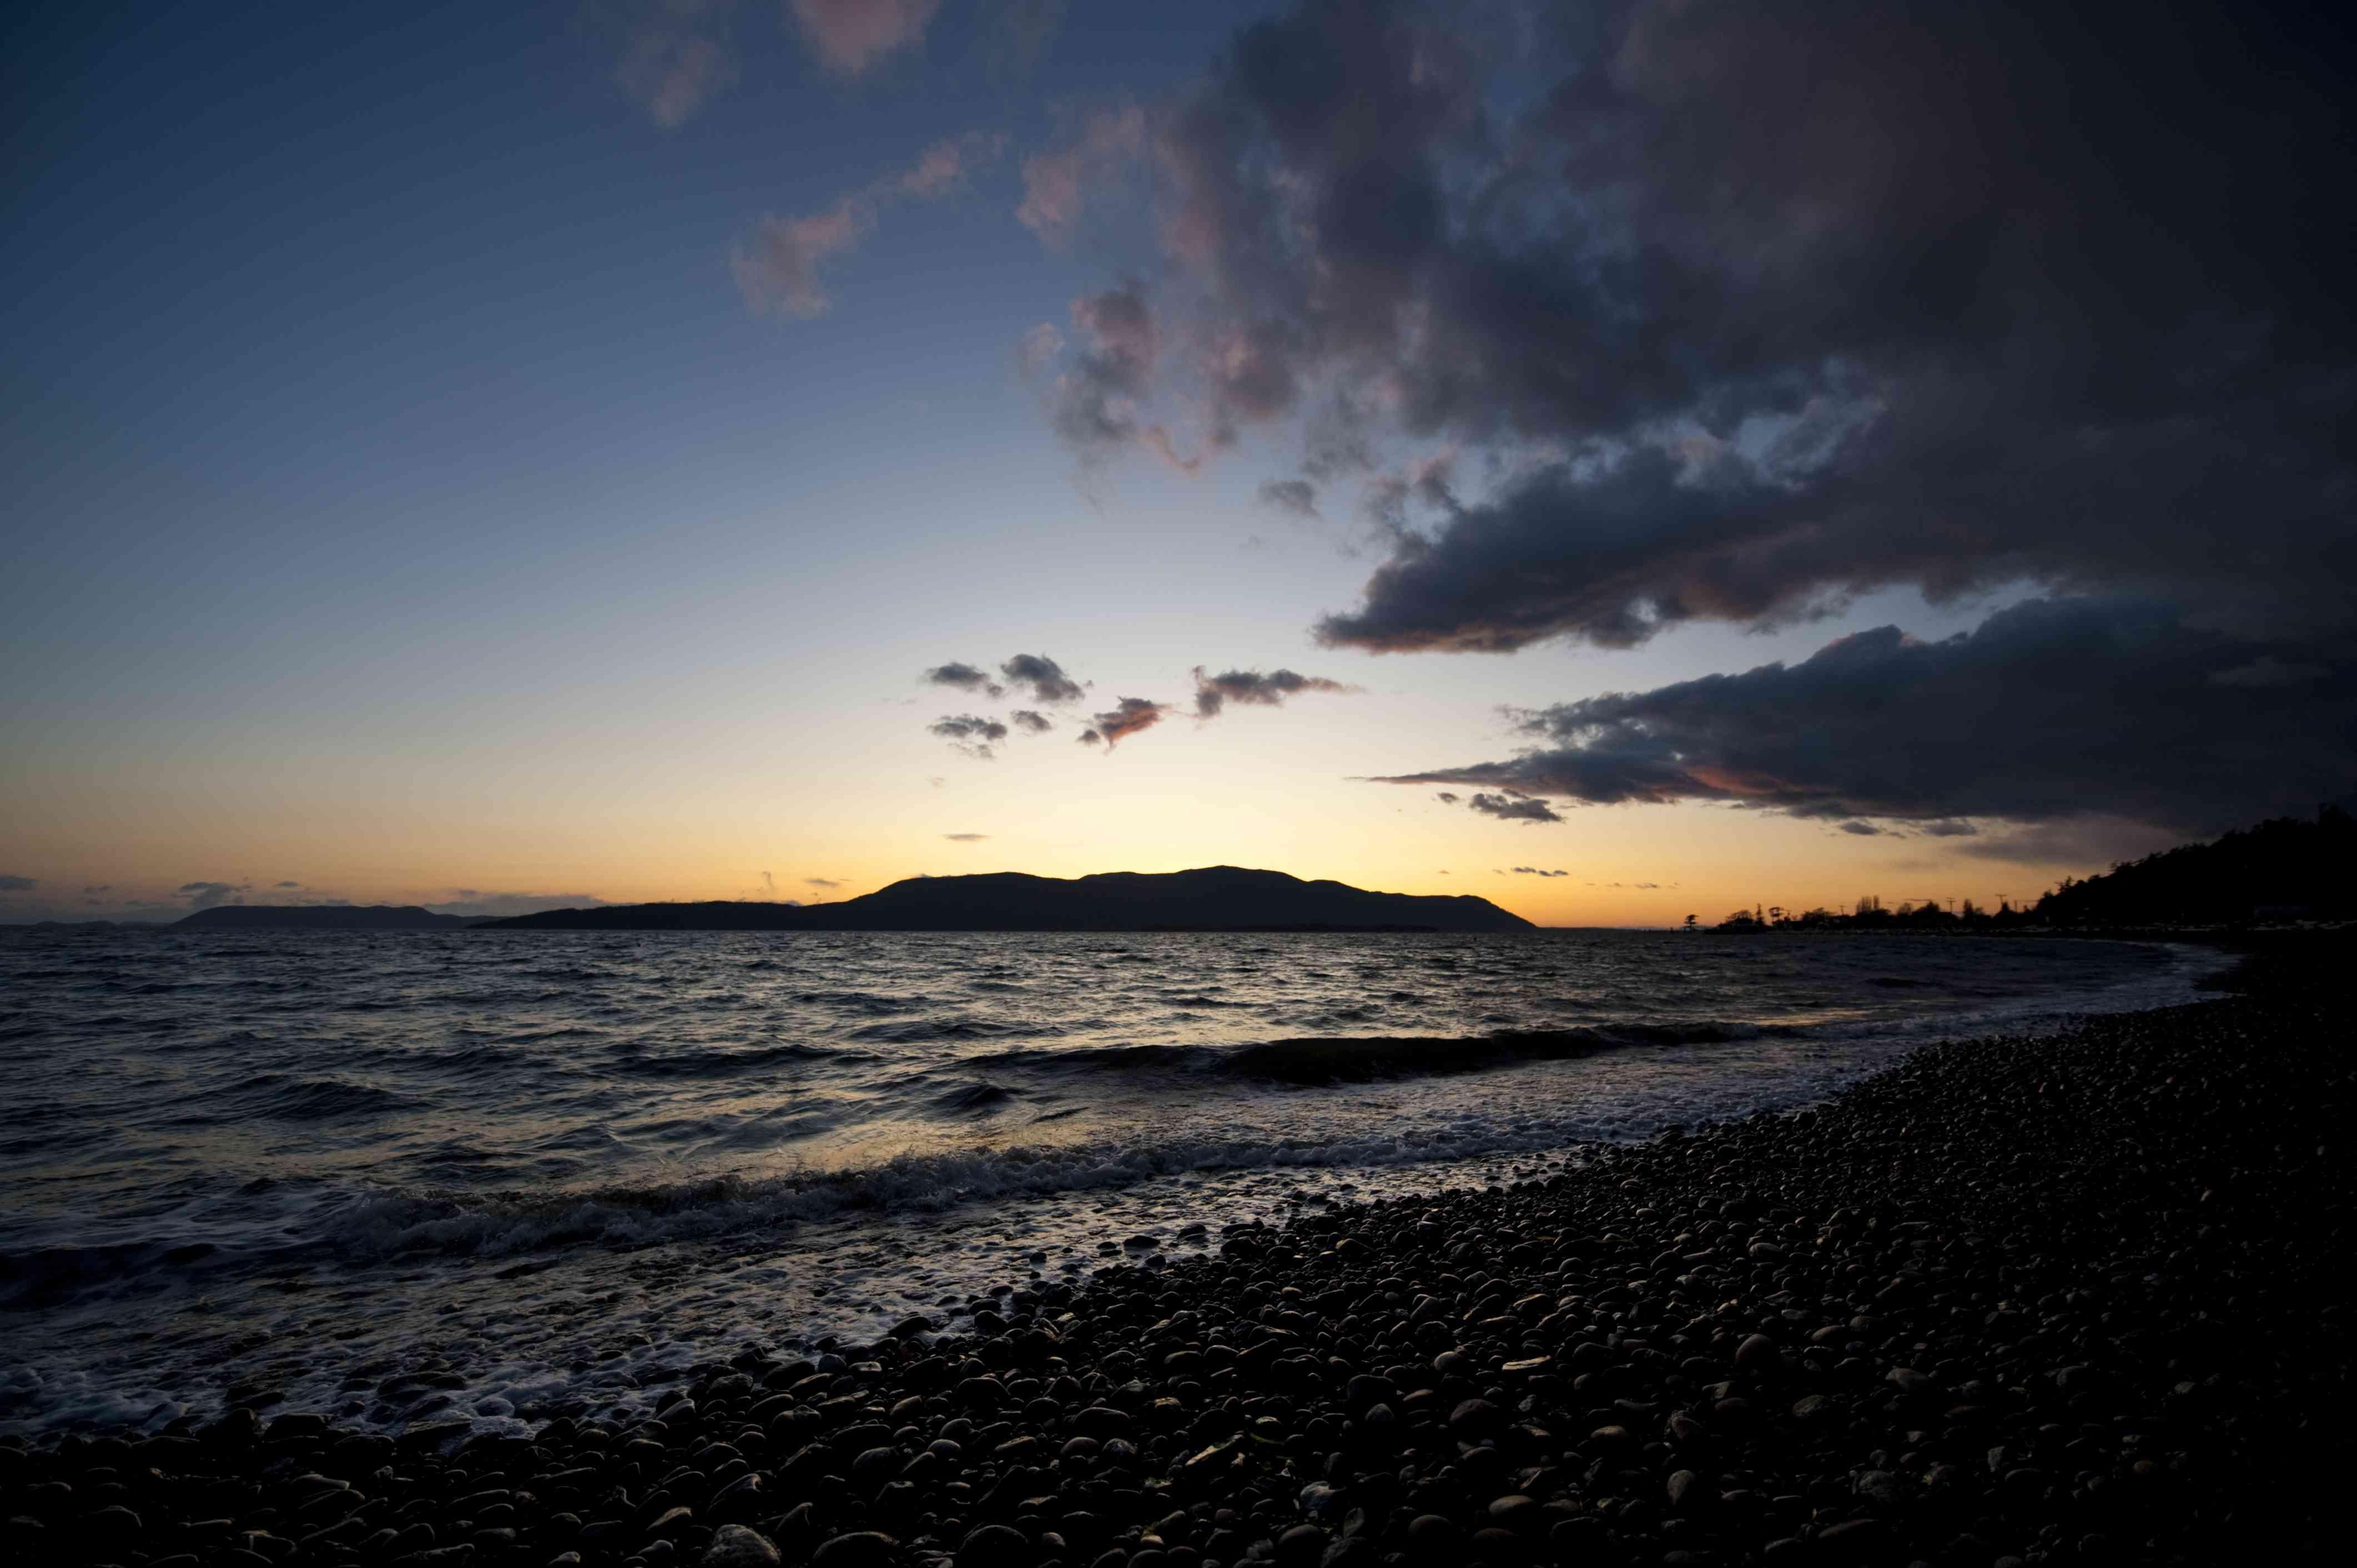 Sunset View of Orcas Island from a Lummi Island Beach.